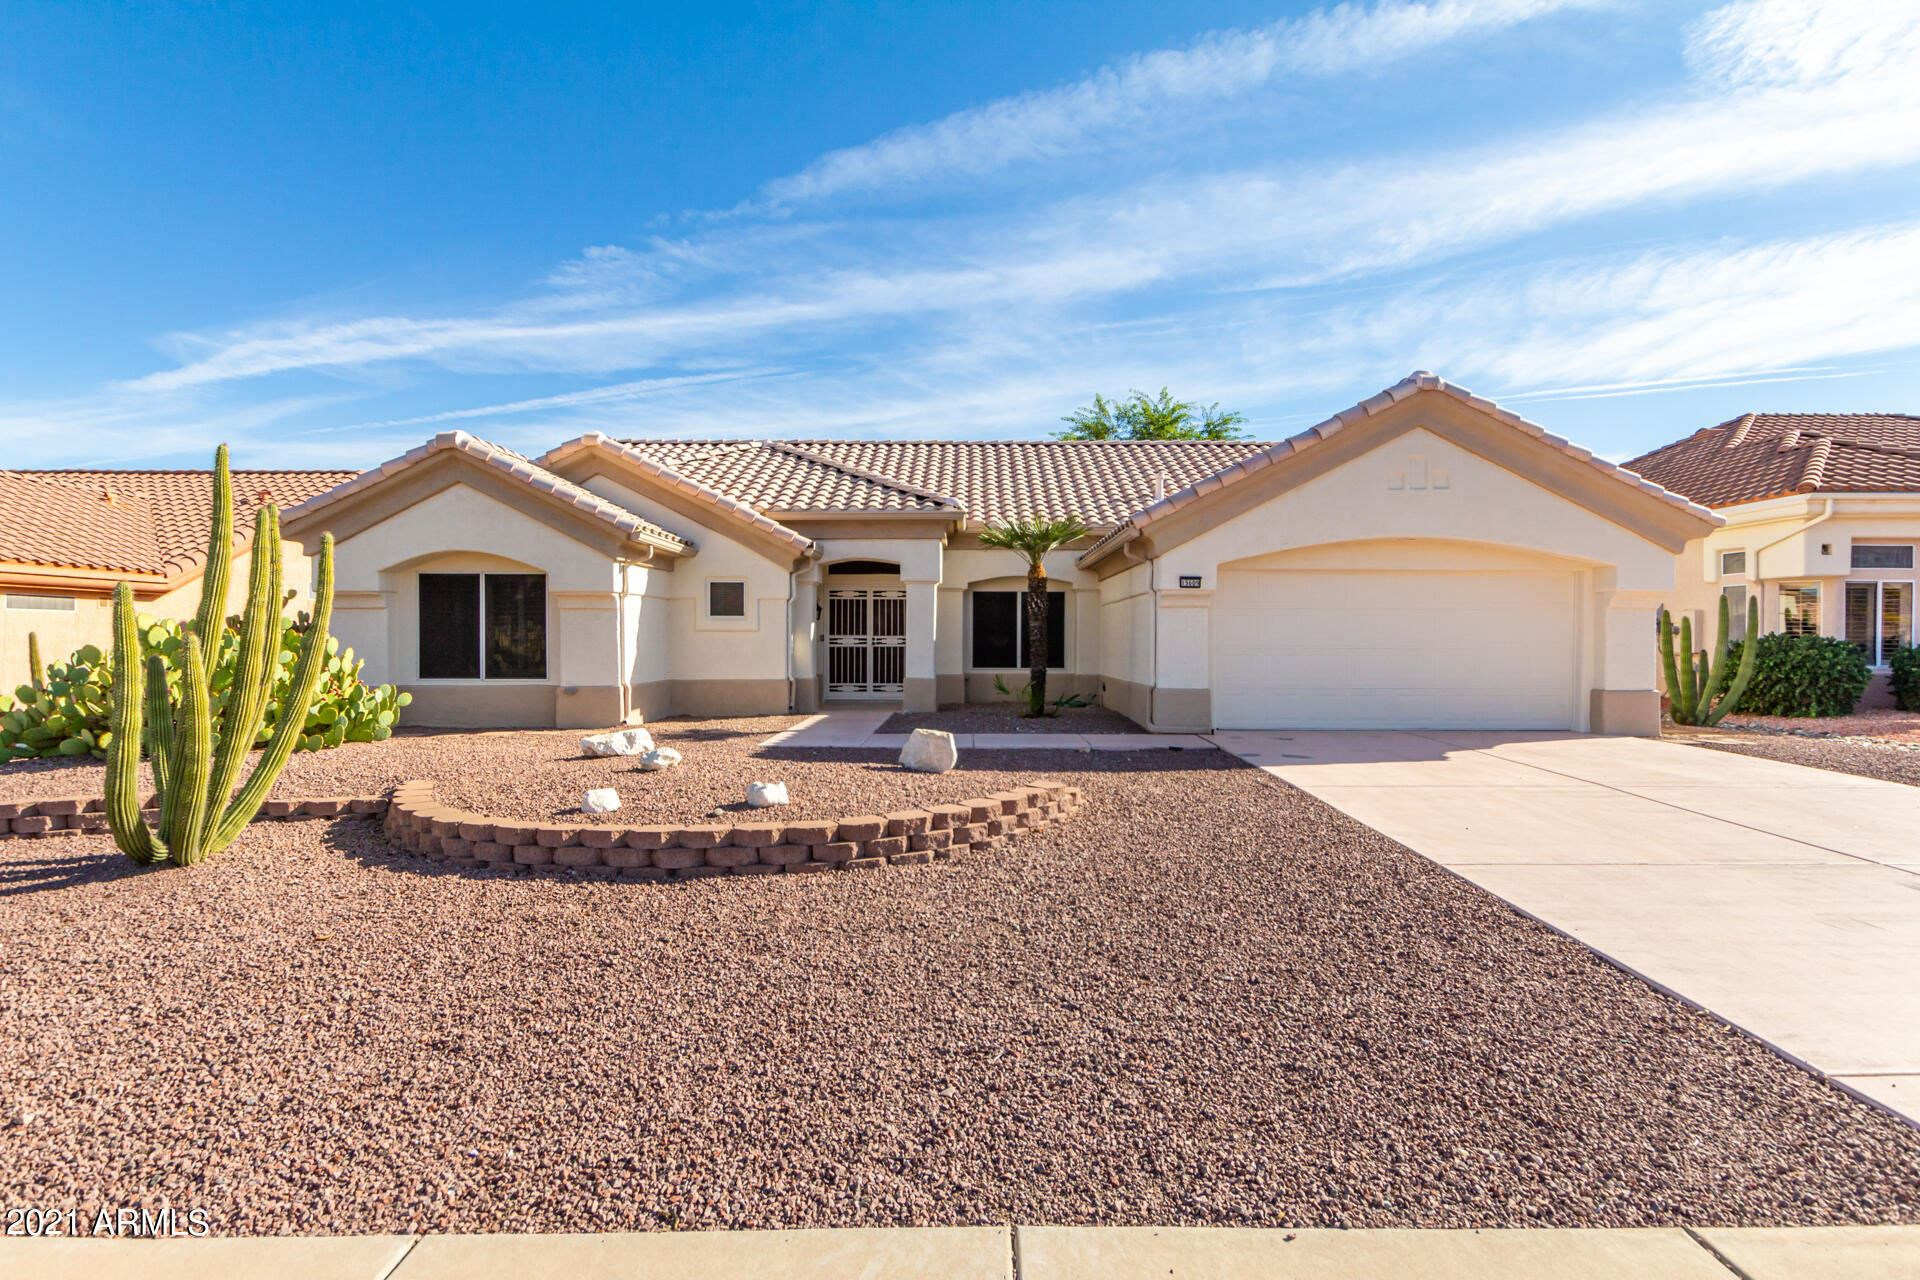 Photo of 15609 W HERITAGE Drive, Sun City West, AZ 85375 (MLS # 6303978)